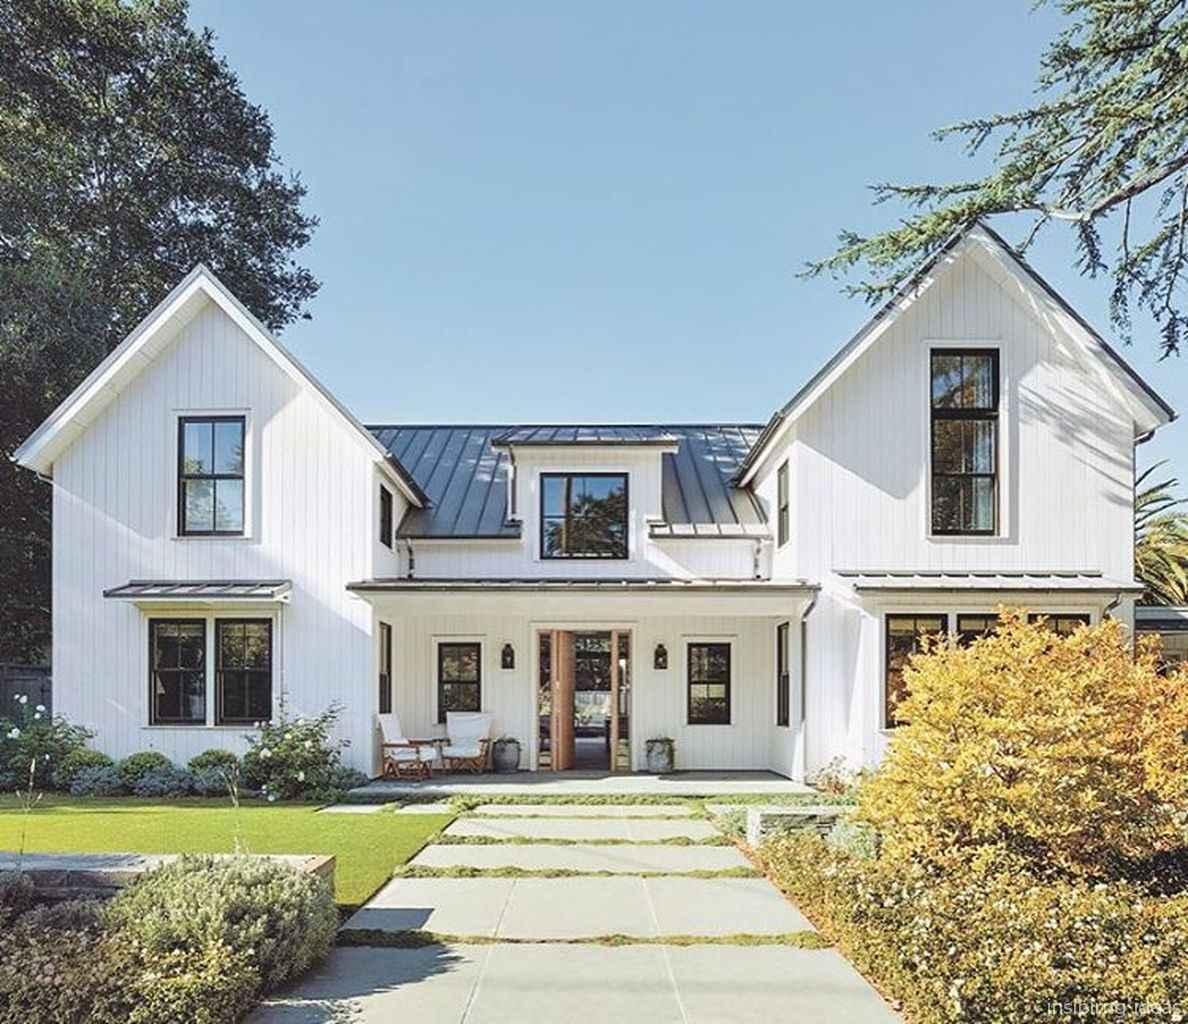 70 affordable modern farmhouse exterior plans ideas 38